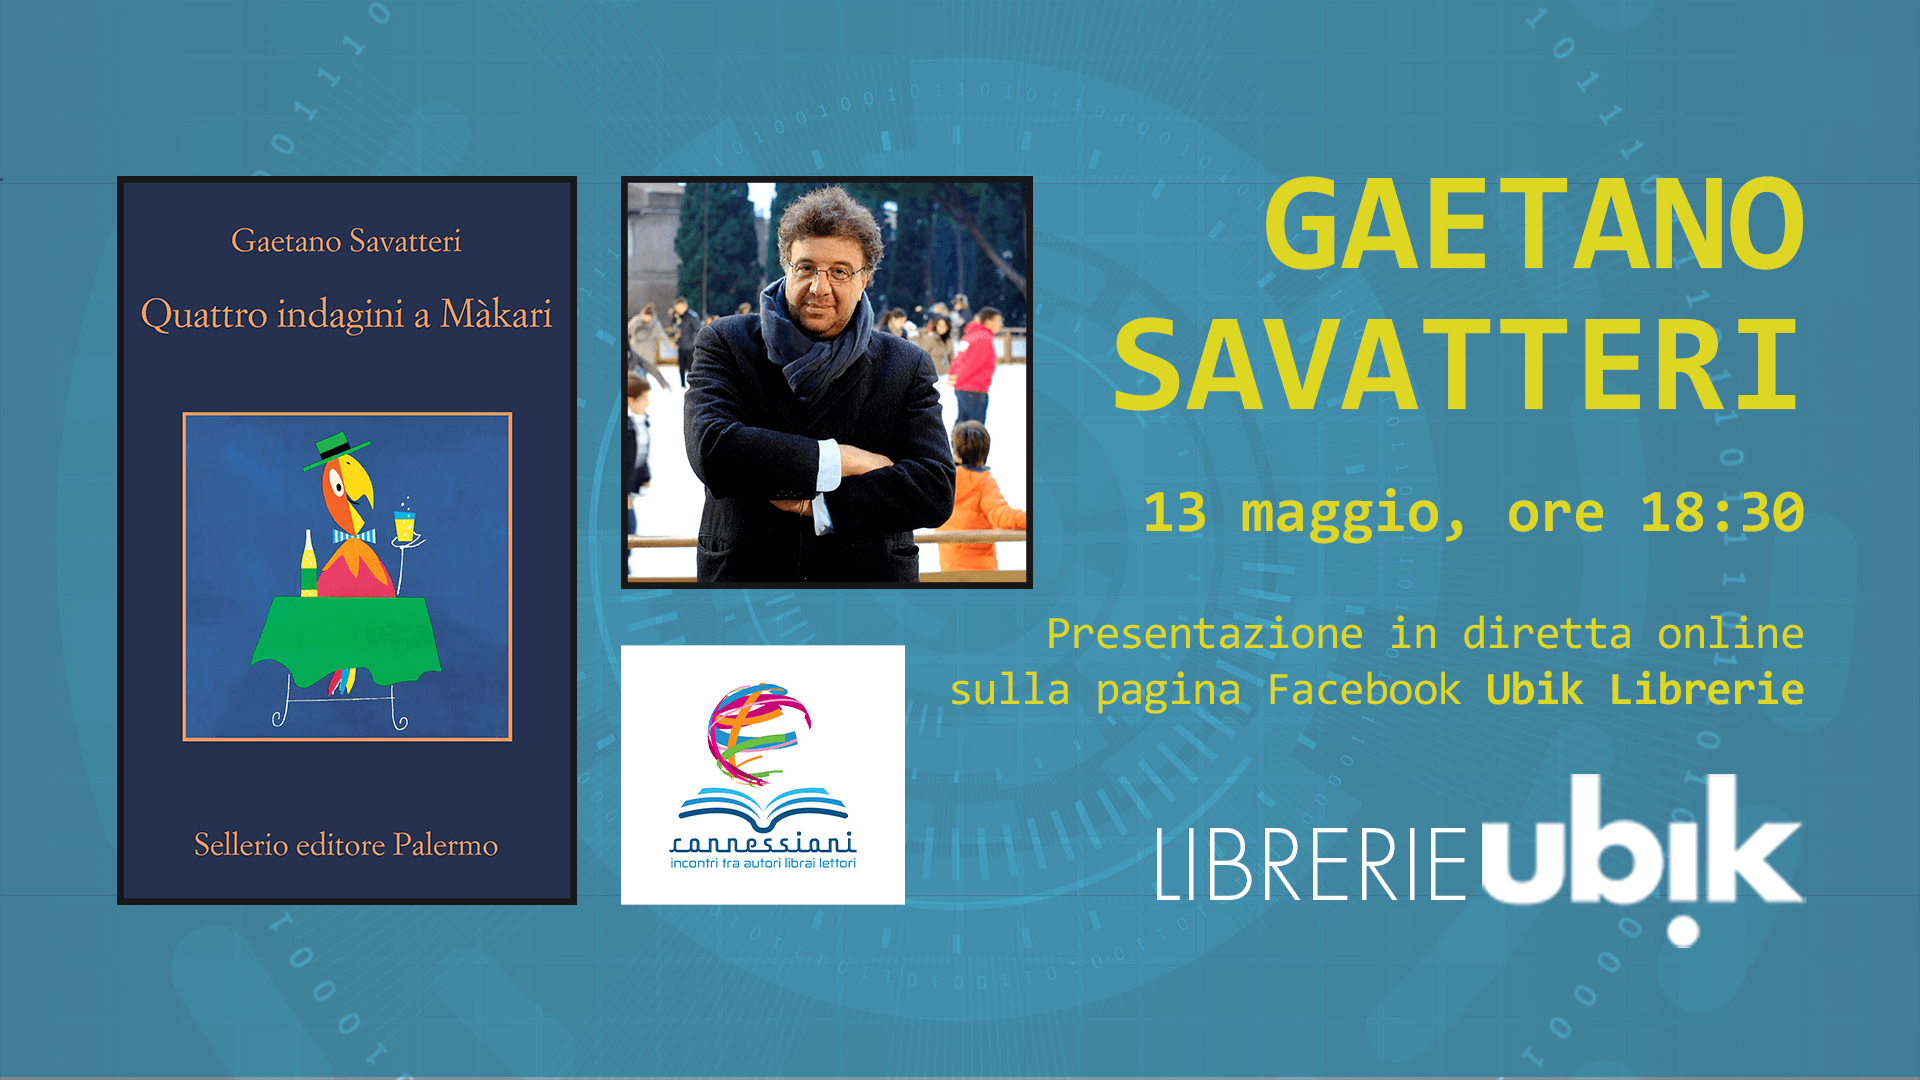 GAETANO SAVATTERI presenta in diretta online